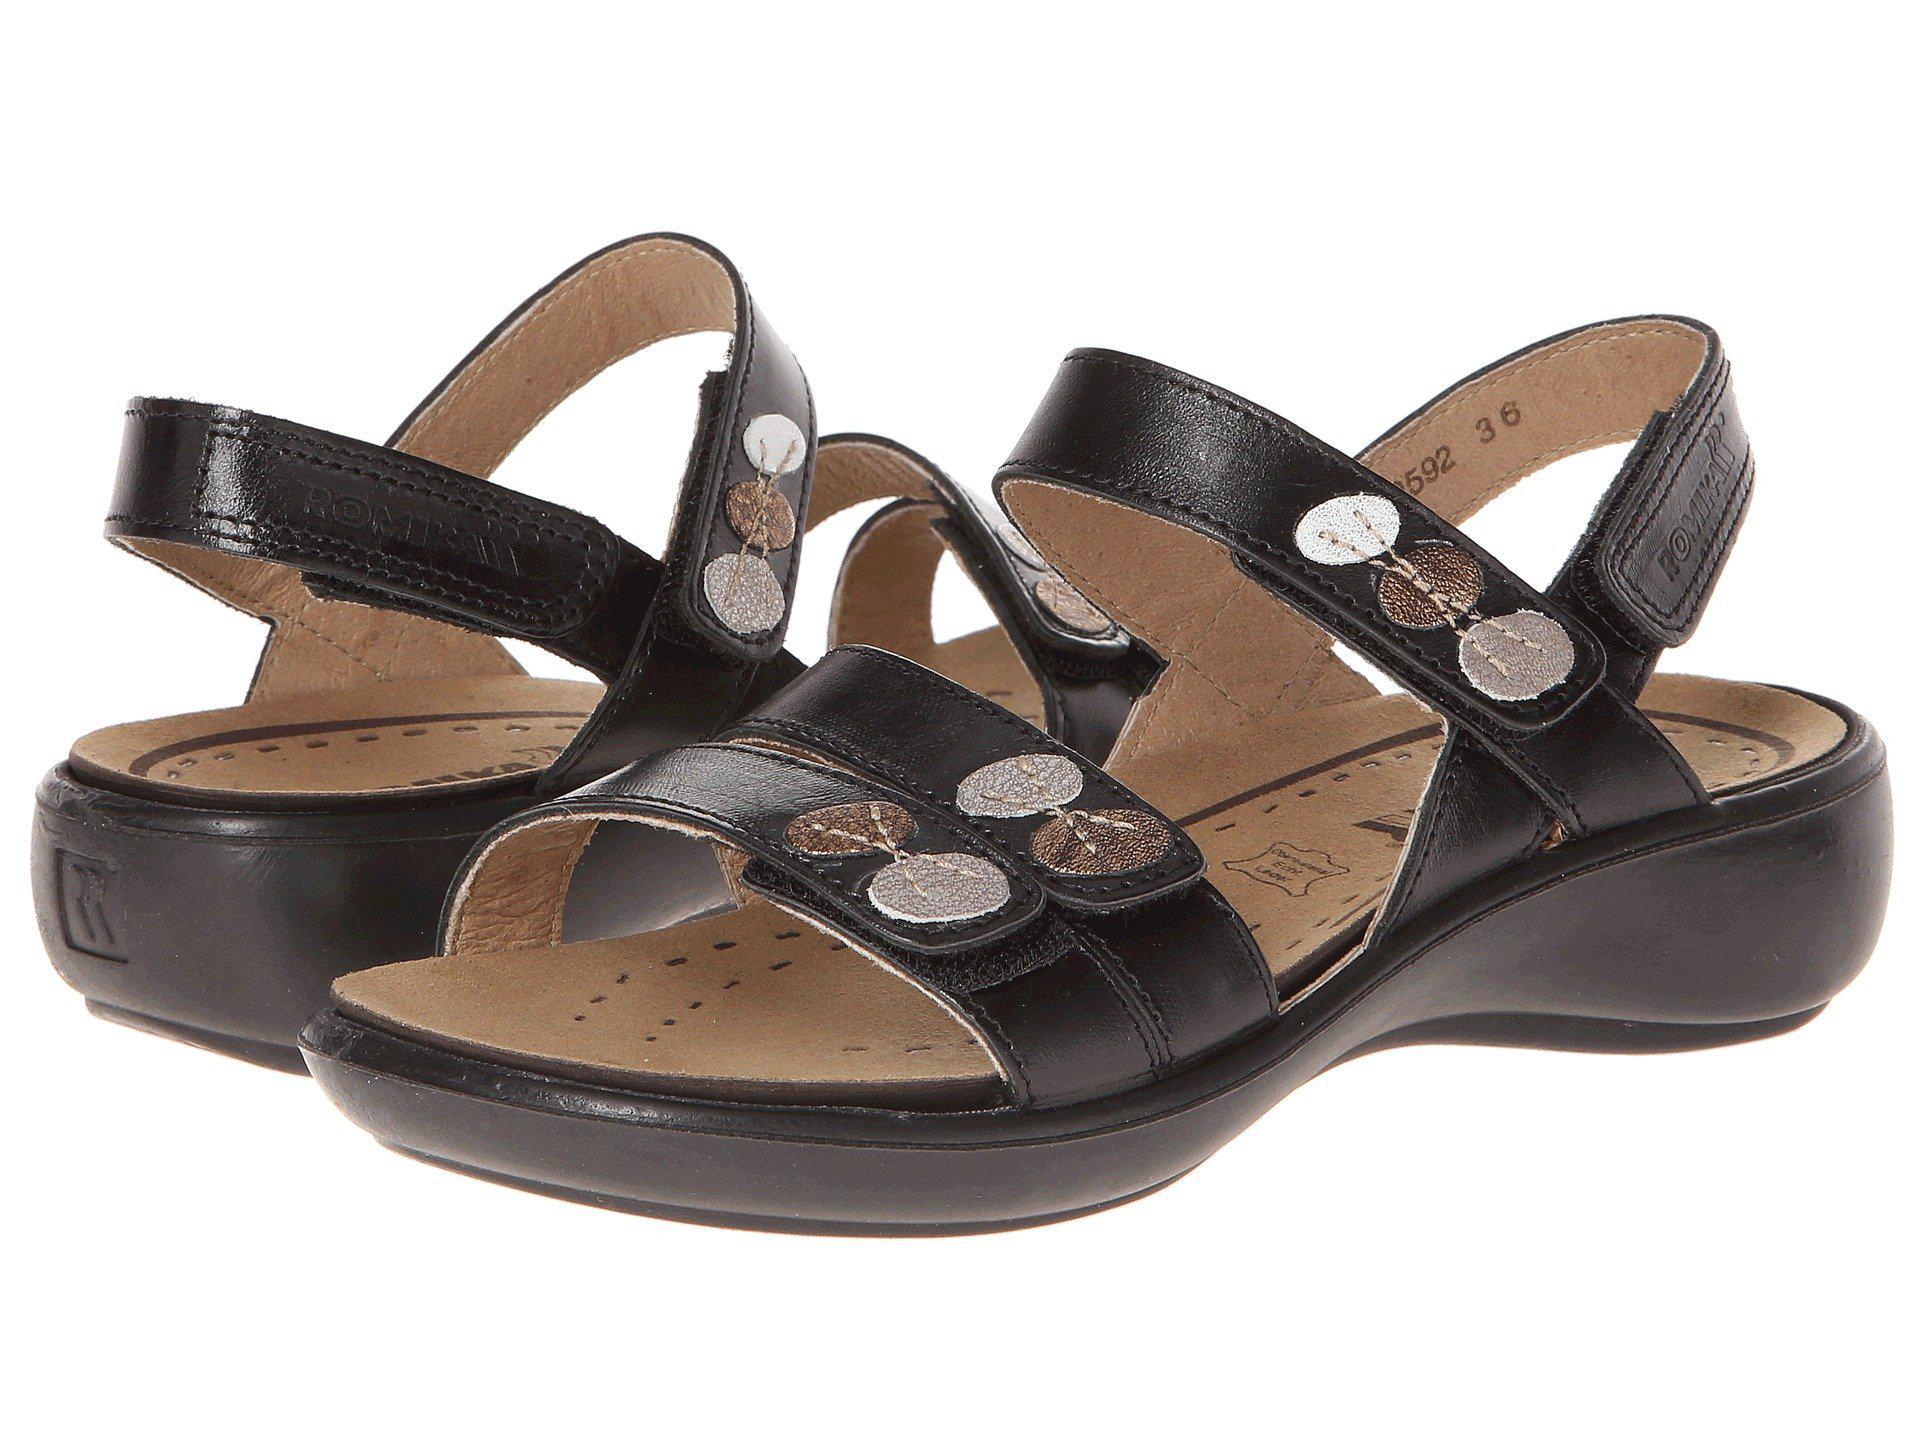 605ec220b172c Romika. Ibiza 55 (black) Women s Sandals.  120  54 From Zappos. Free  shipping ...